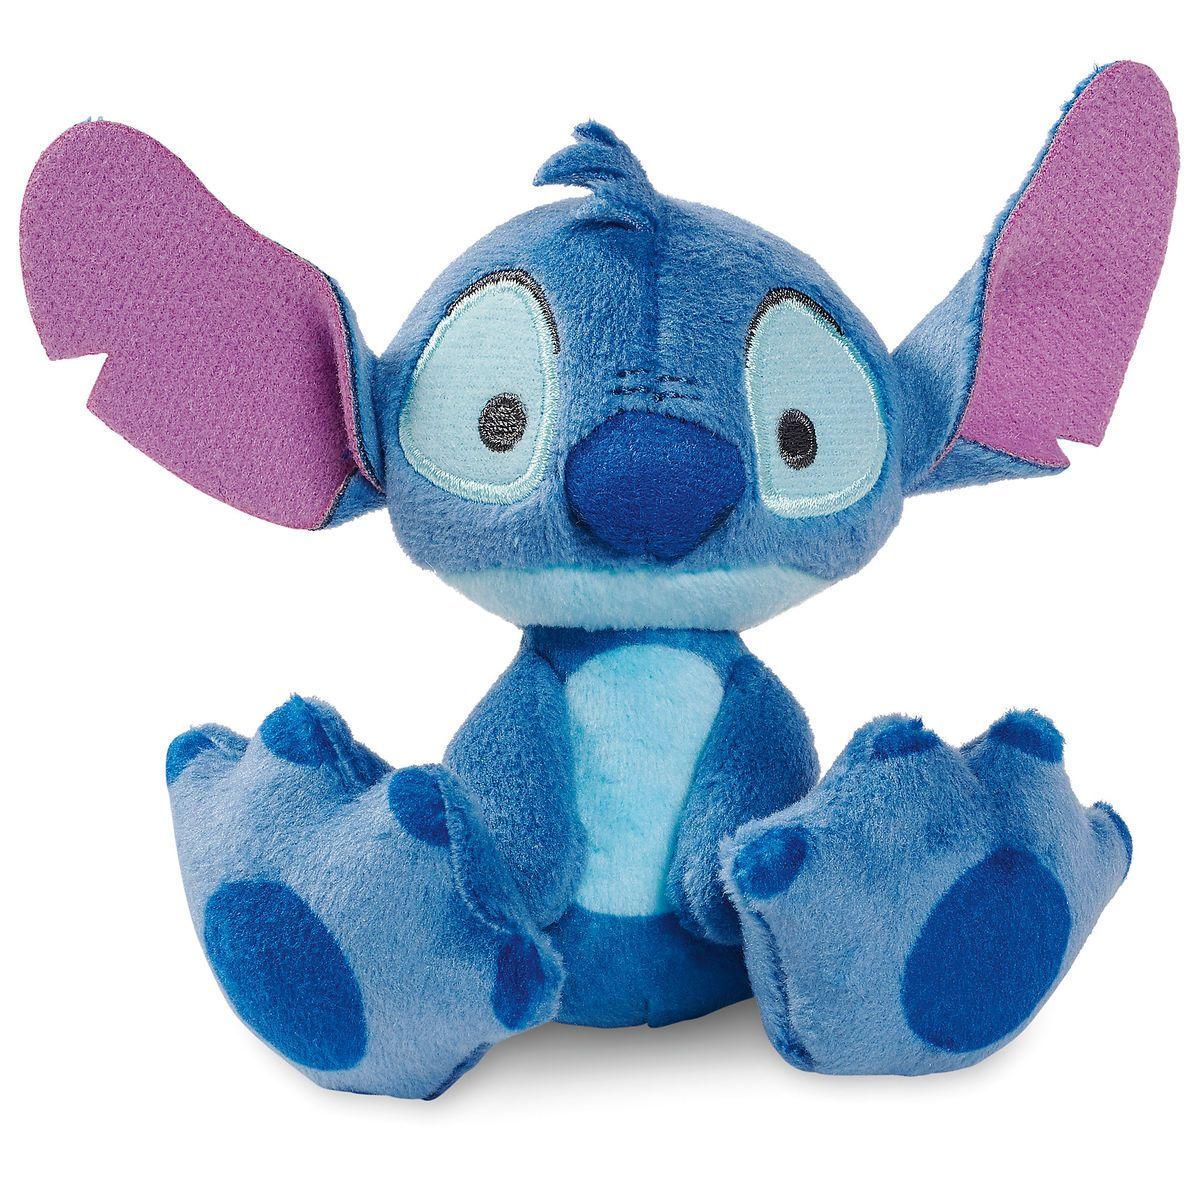 d73191cc Stitch Tiny Big Feet Plush - Micro | Toys: Stuffed Animals | Toys ...